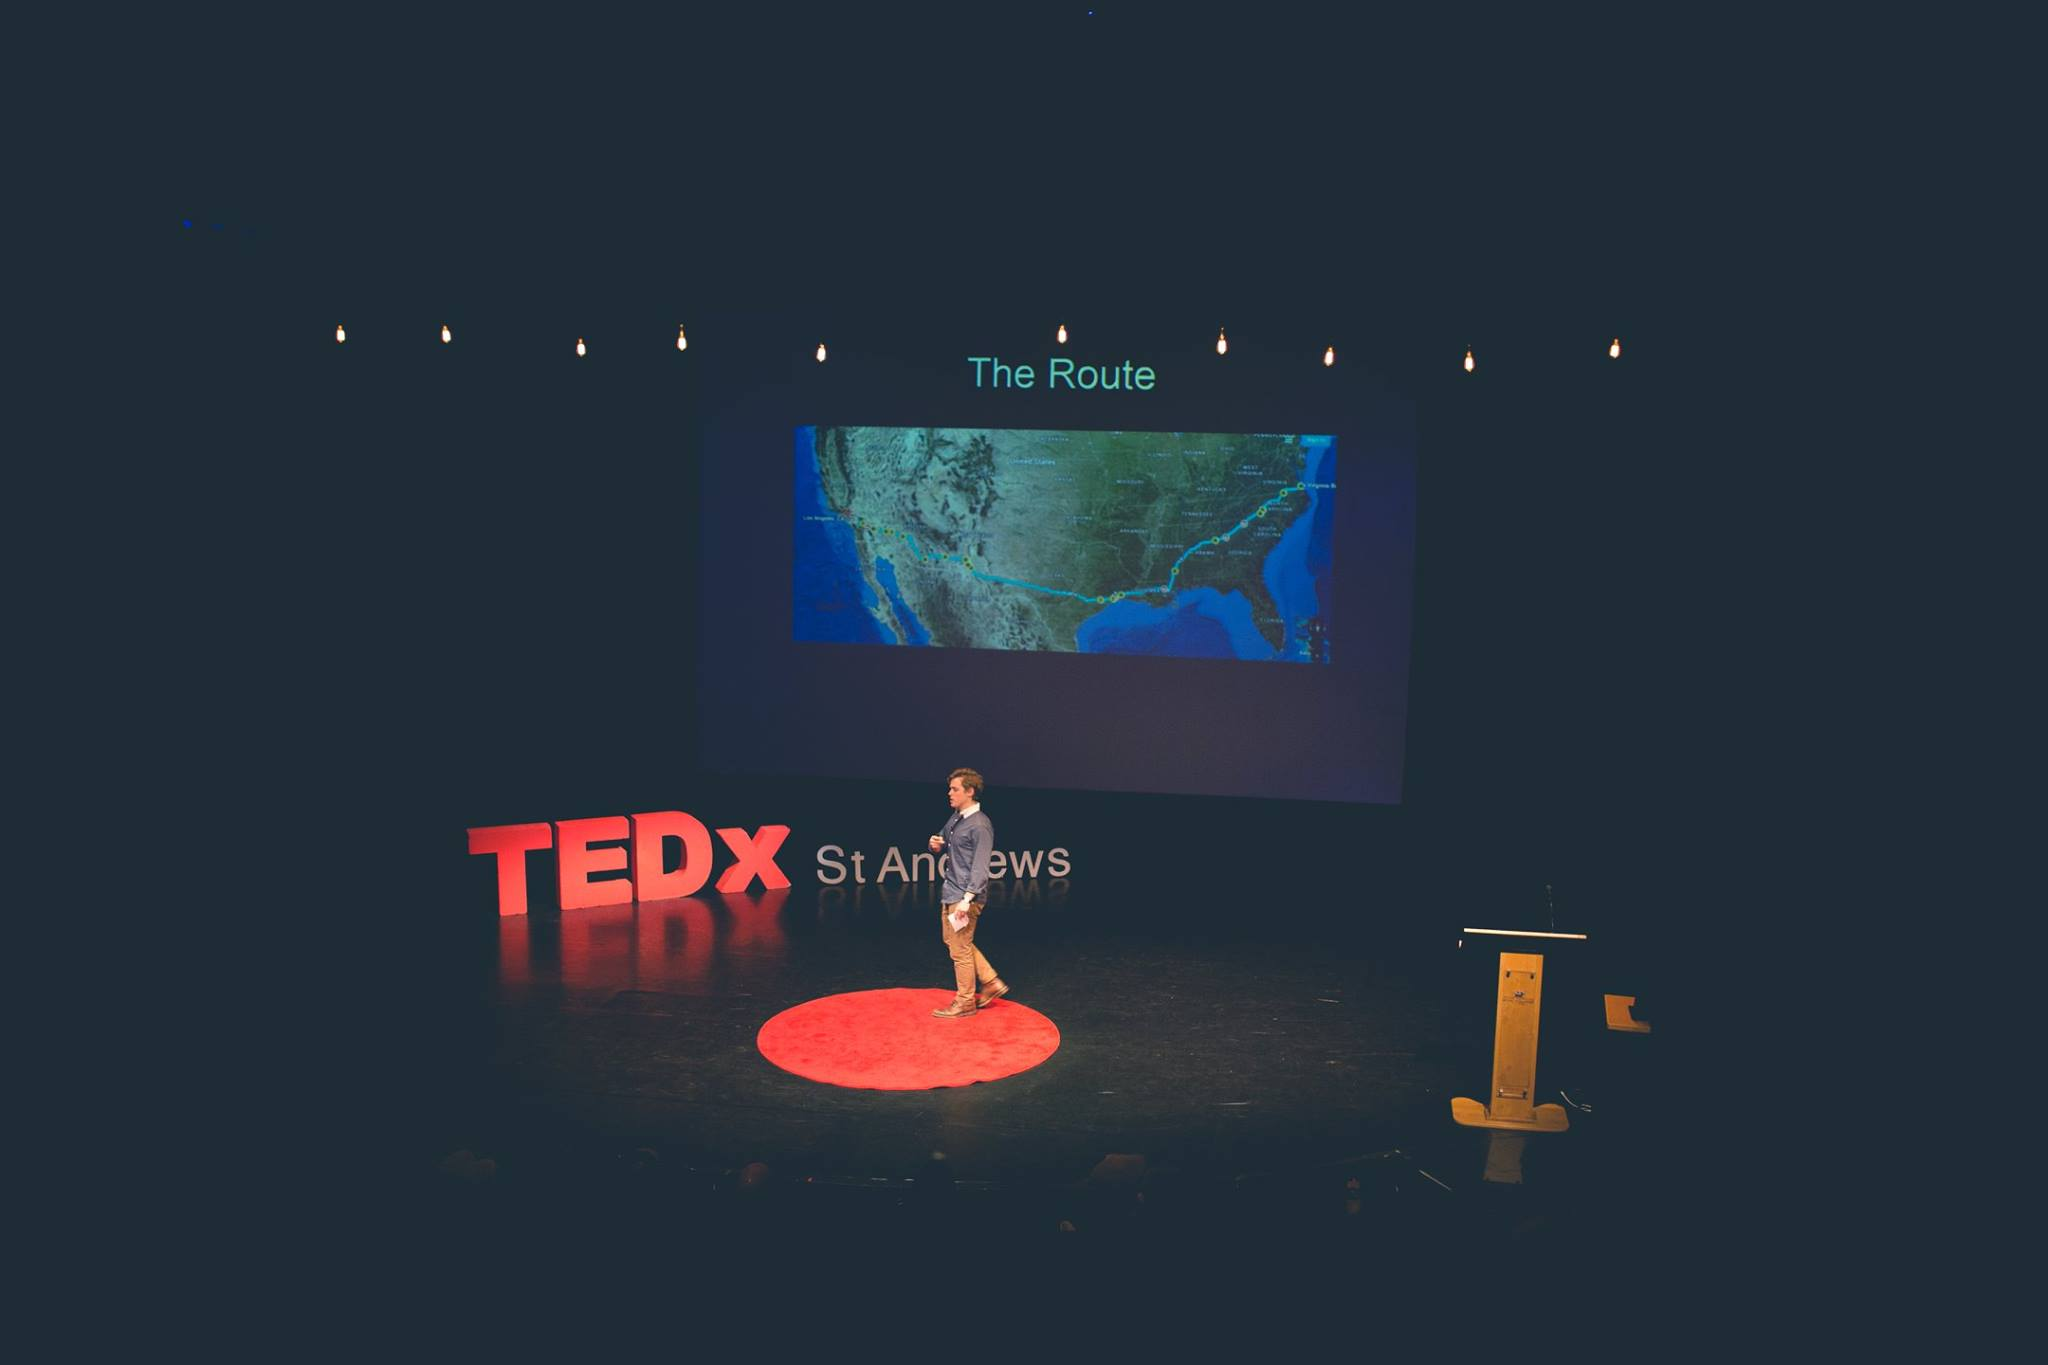 Photo from Tedx 10.jpg